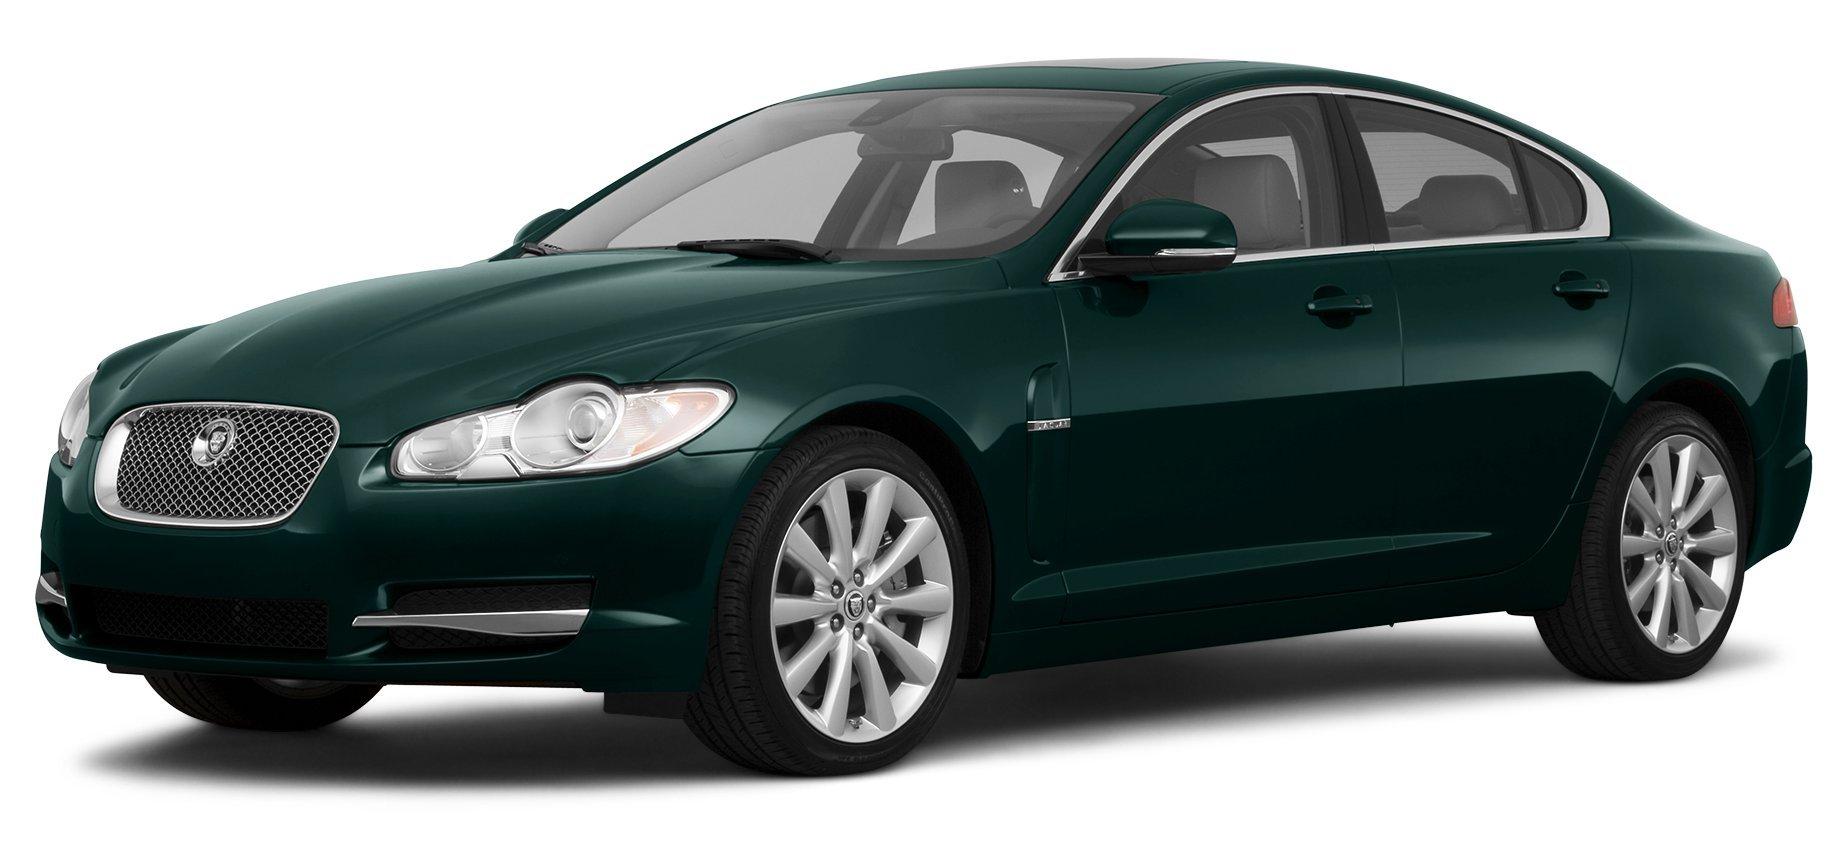 Amazon.com: 2010 Jaguar XF Luxury Reviews, Images, and ...